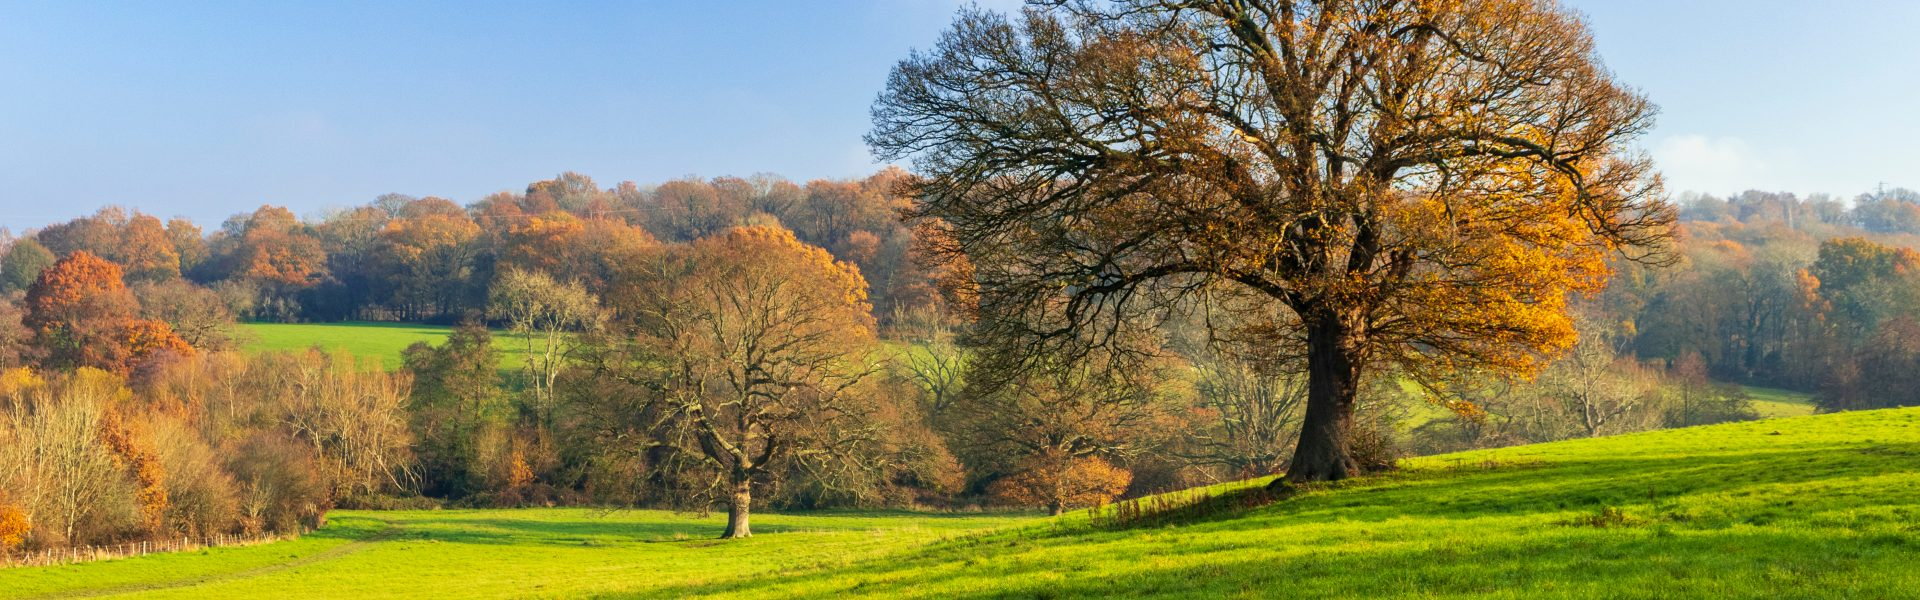 Last Days of Autumn on Southborough Common